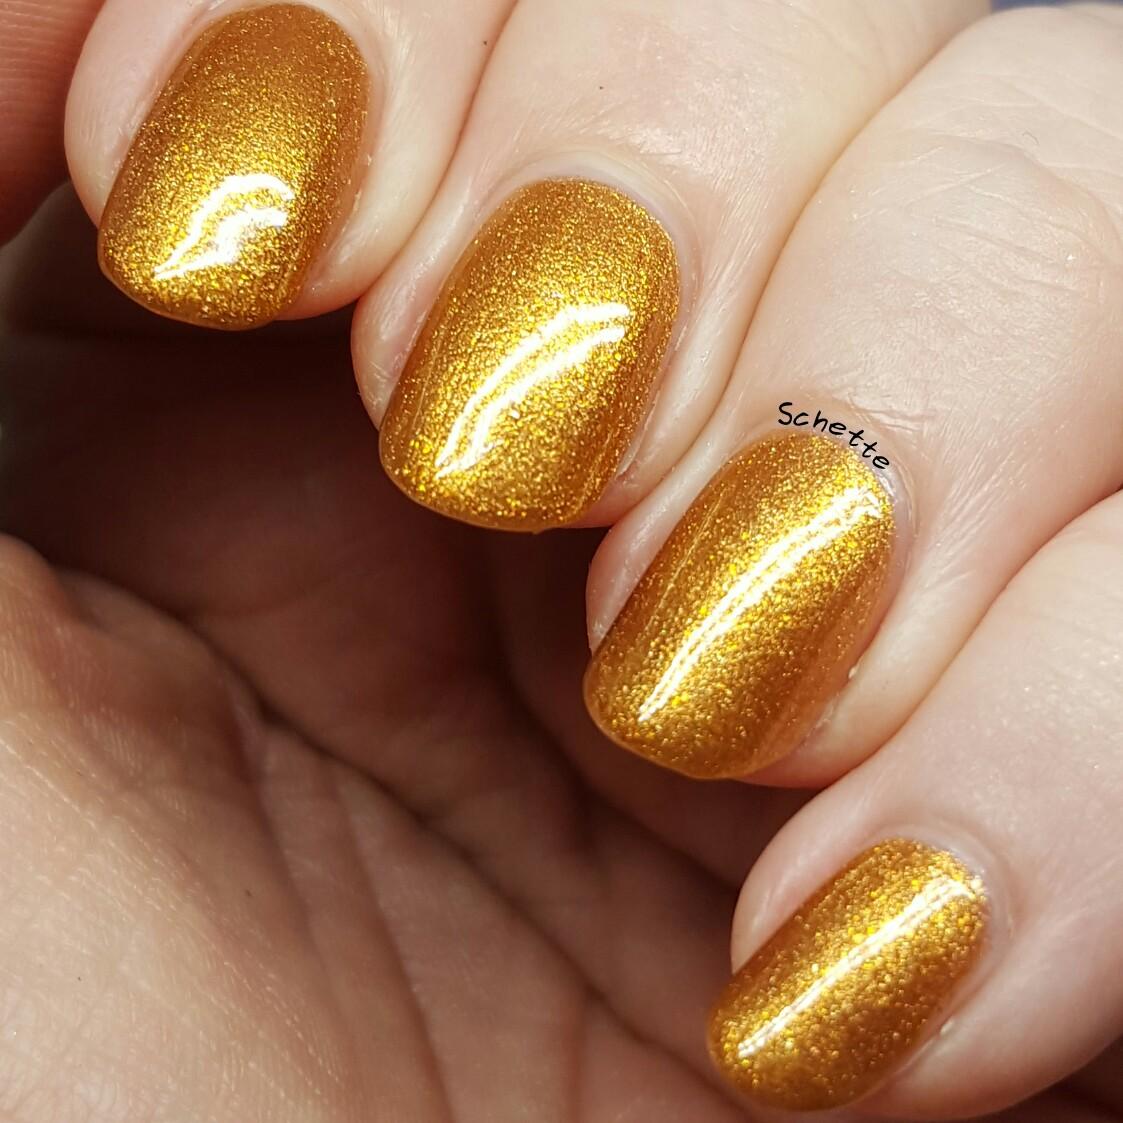 China Glaze - In awe of amber